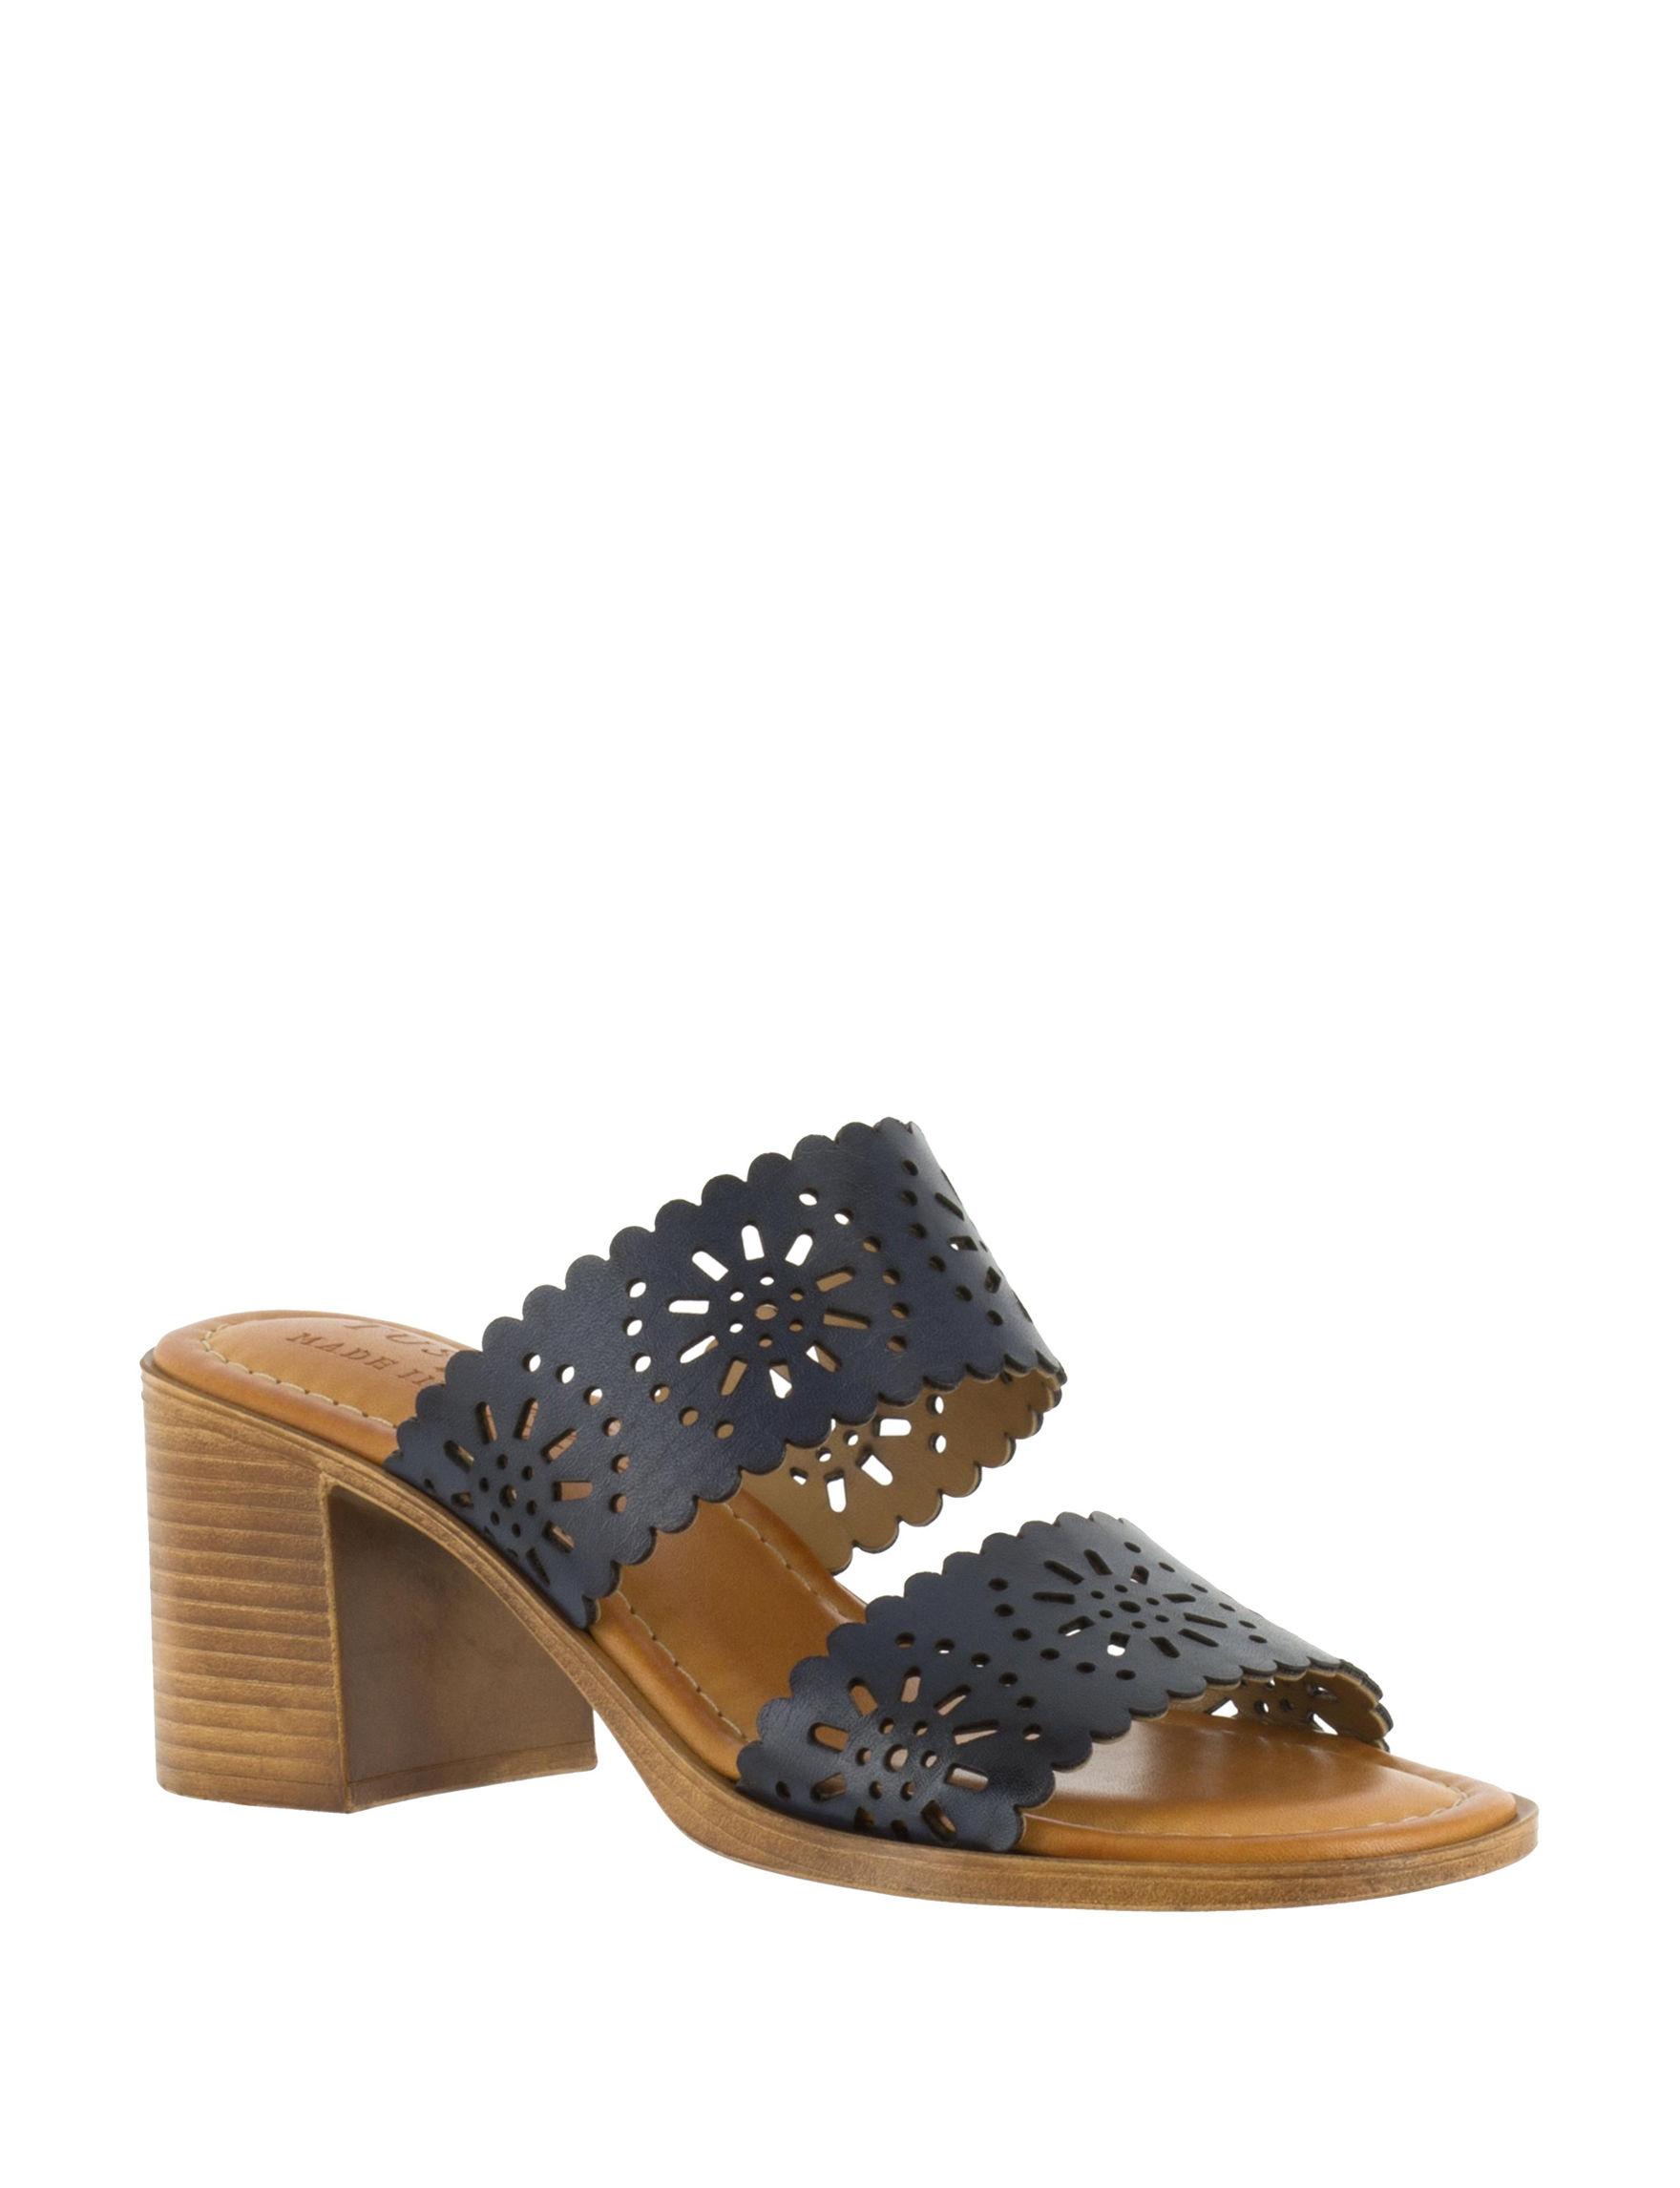 Easy Street Navy Wedge Sandals